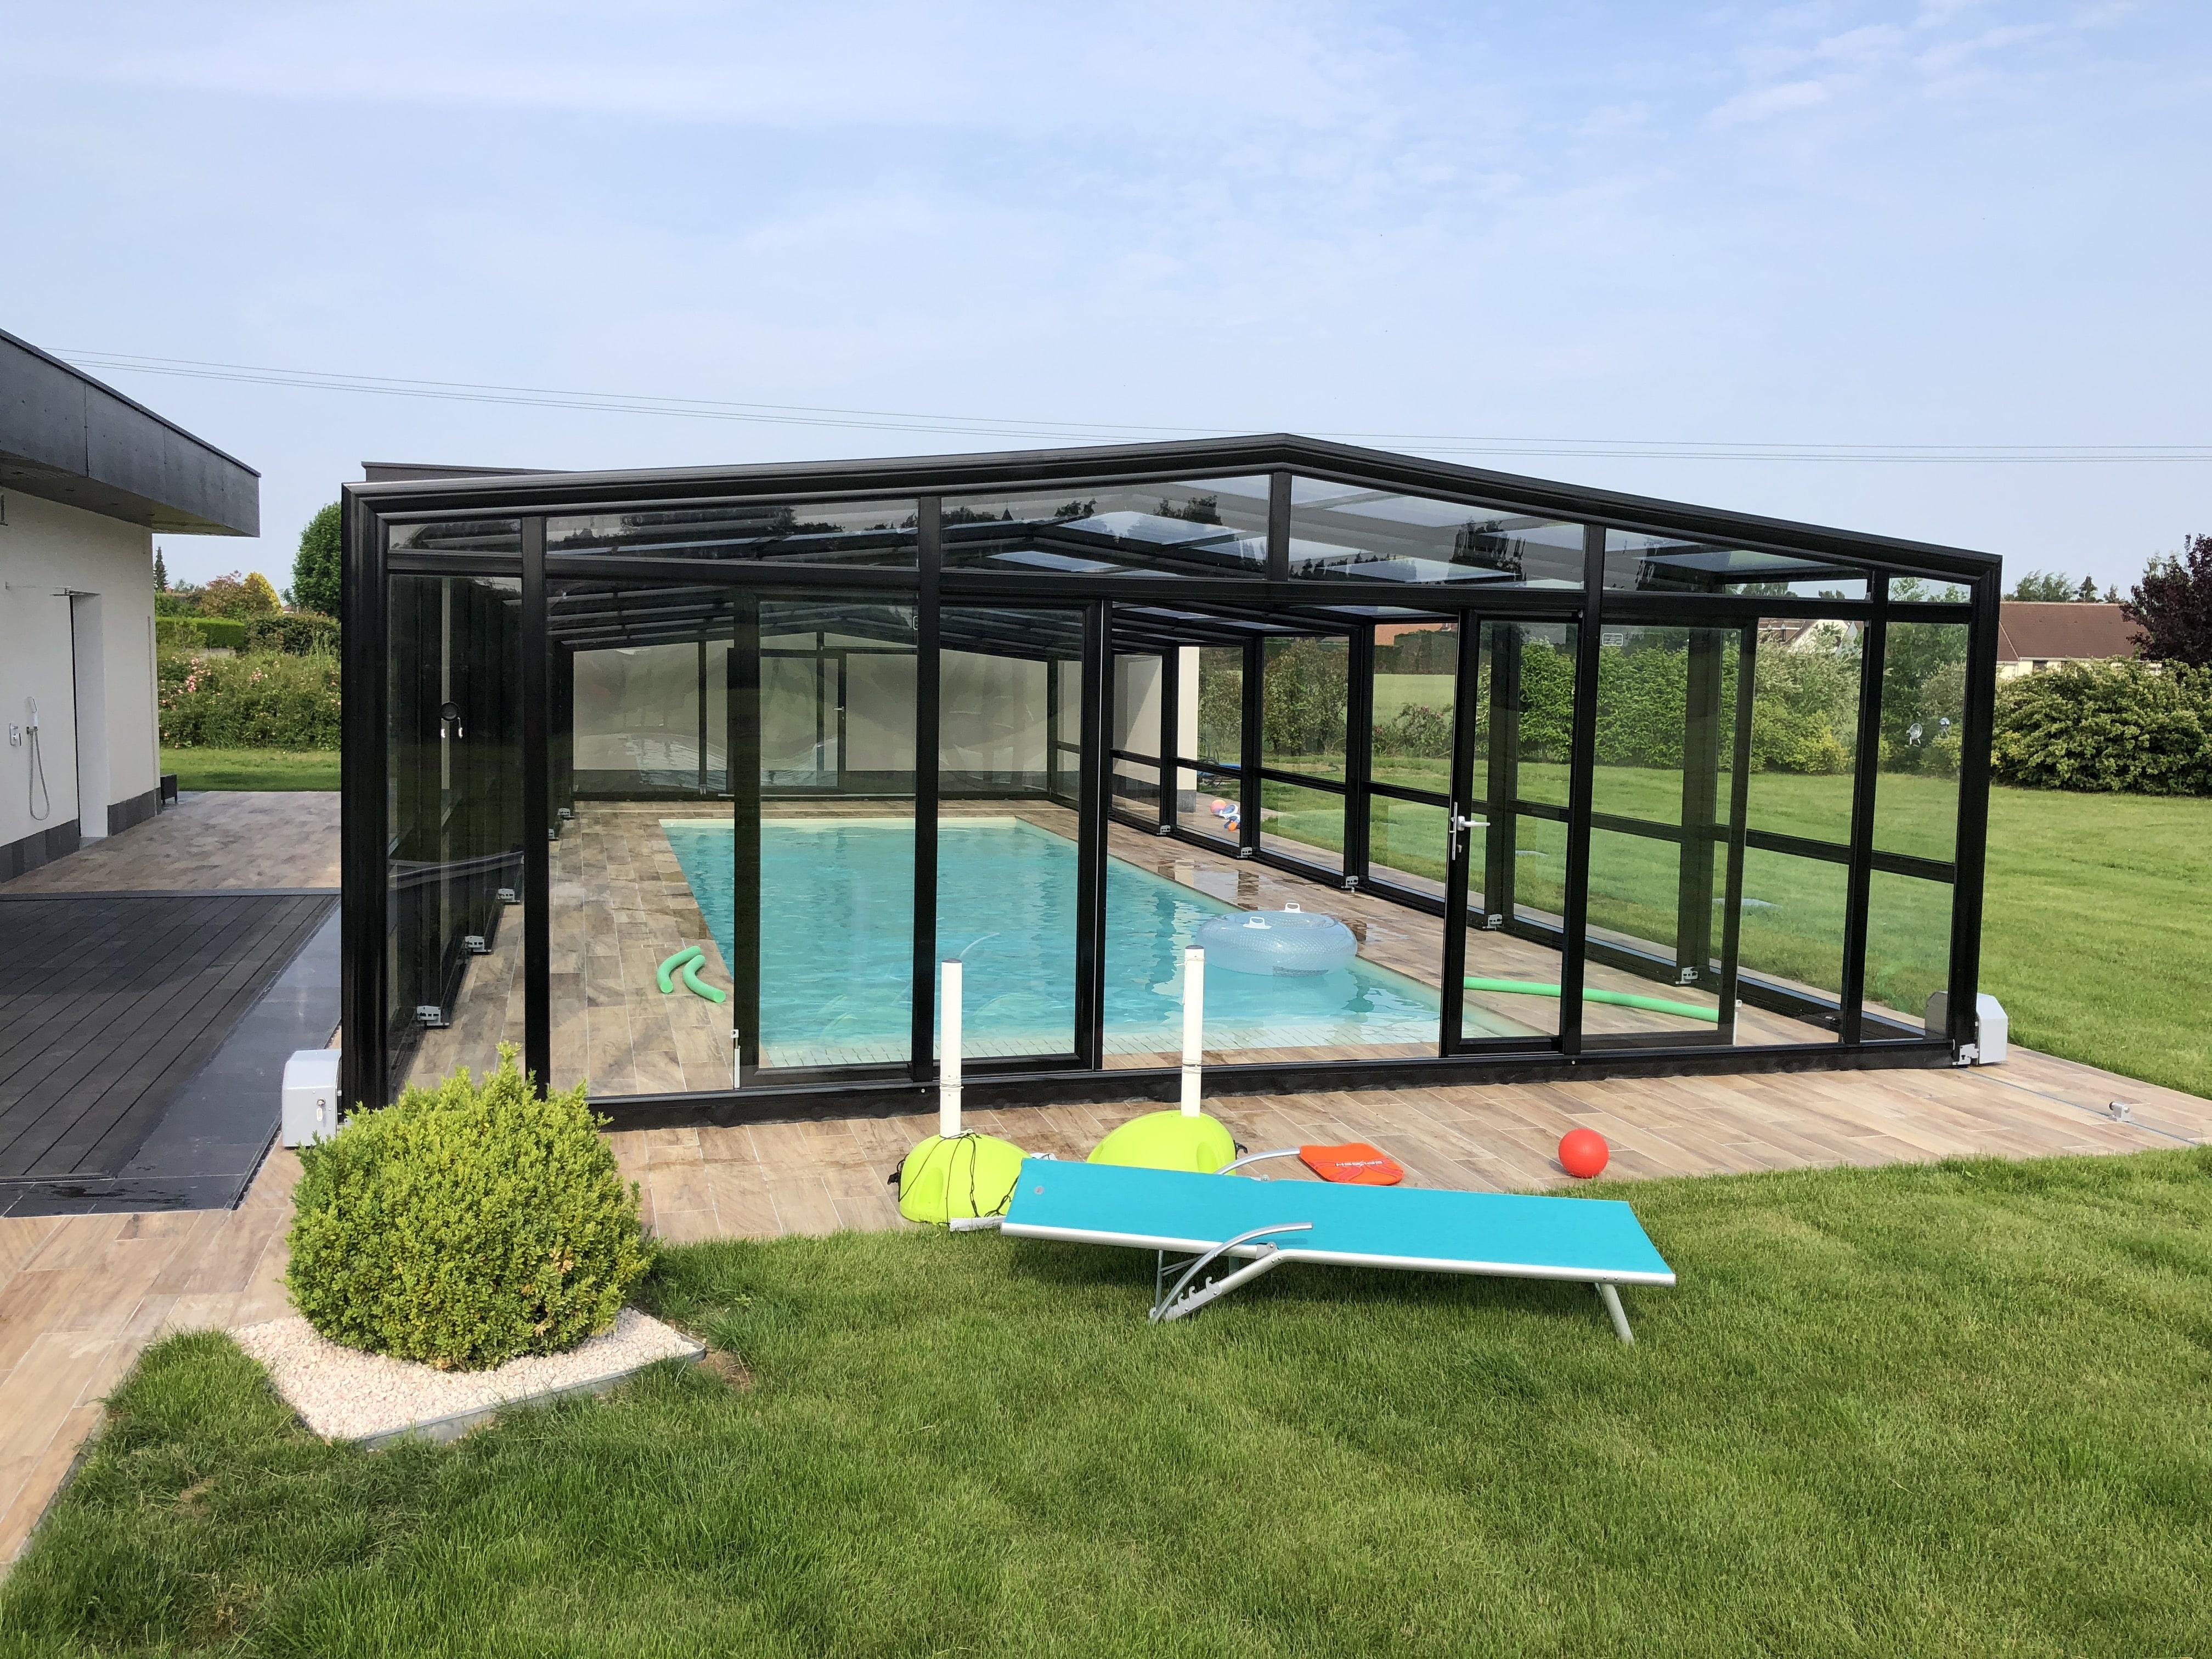 Abri de piscine adossé Façade - Merville (59)